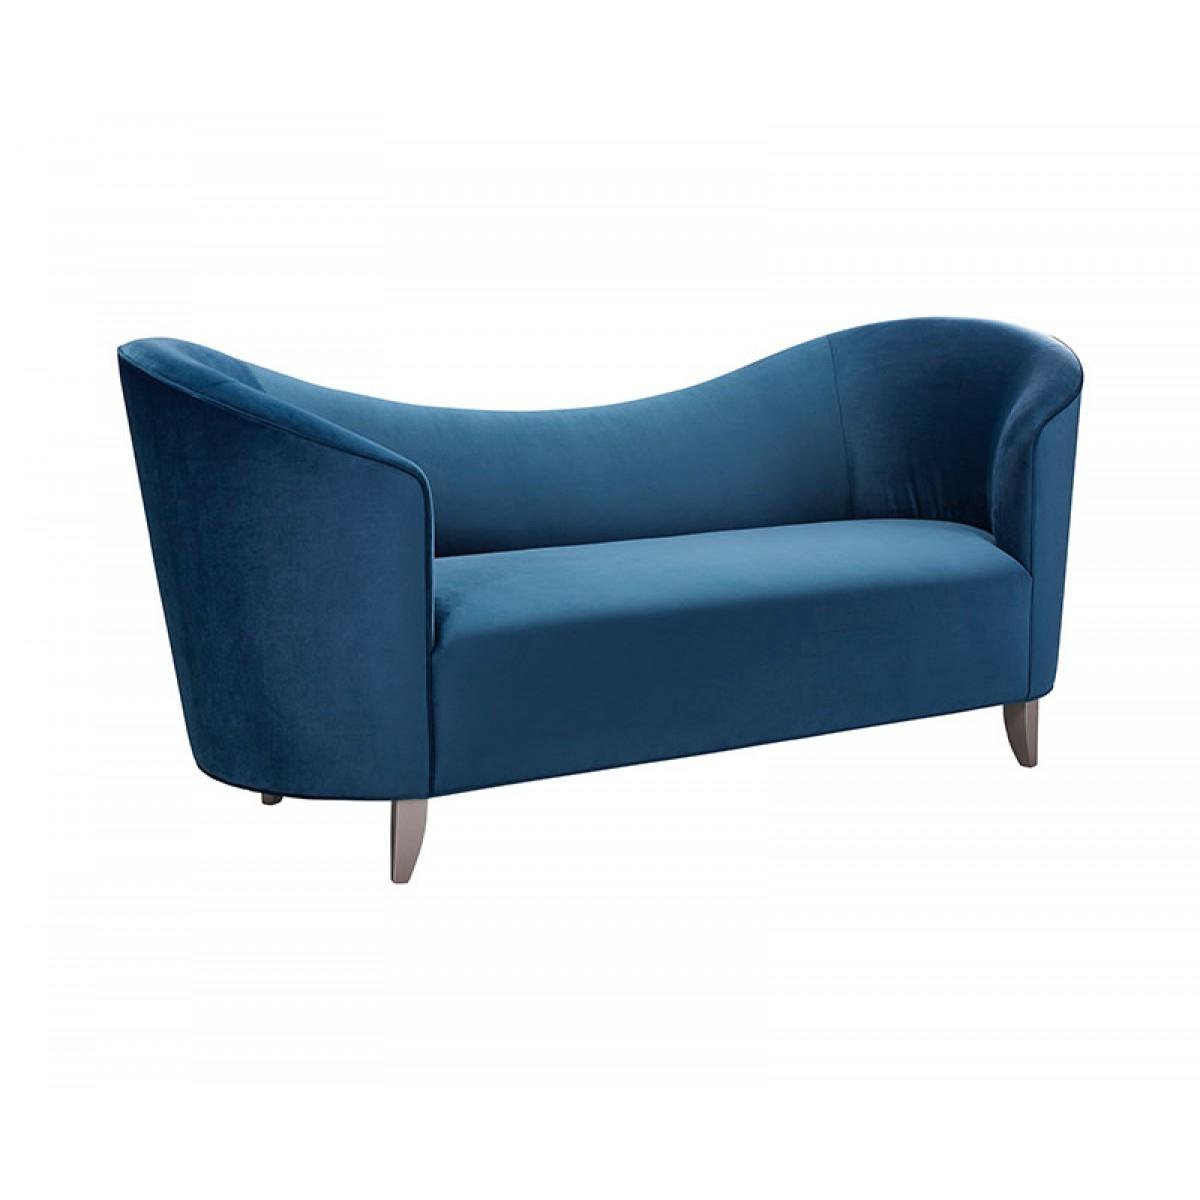 Thomasville Josephine Small Sofa With Regard To Josephine Sofa Chairs (Image 24 of 25)